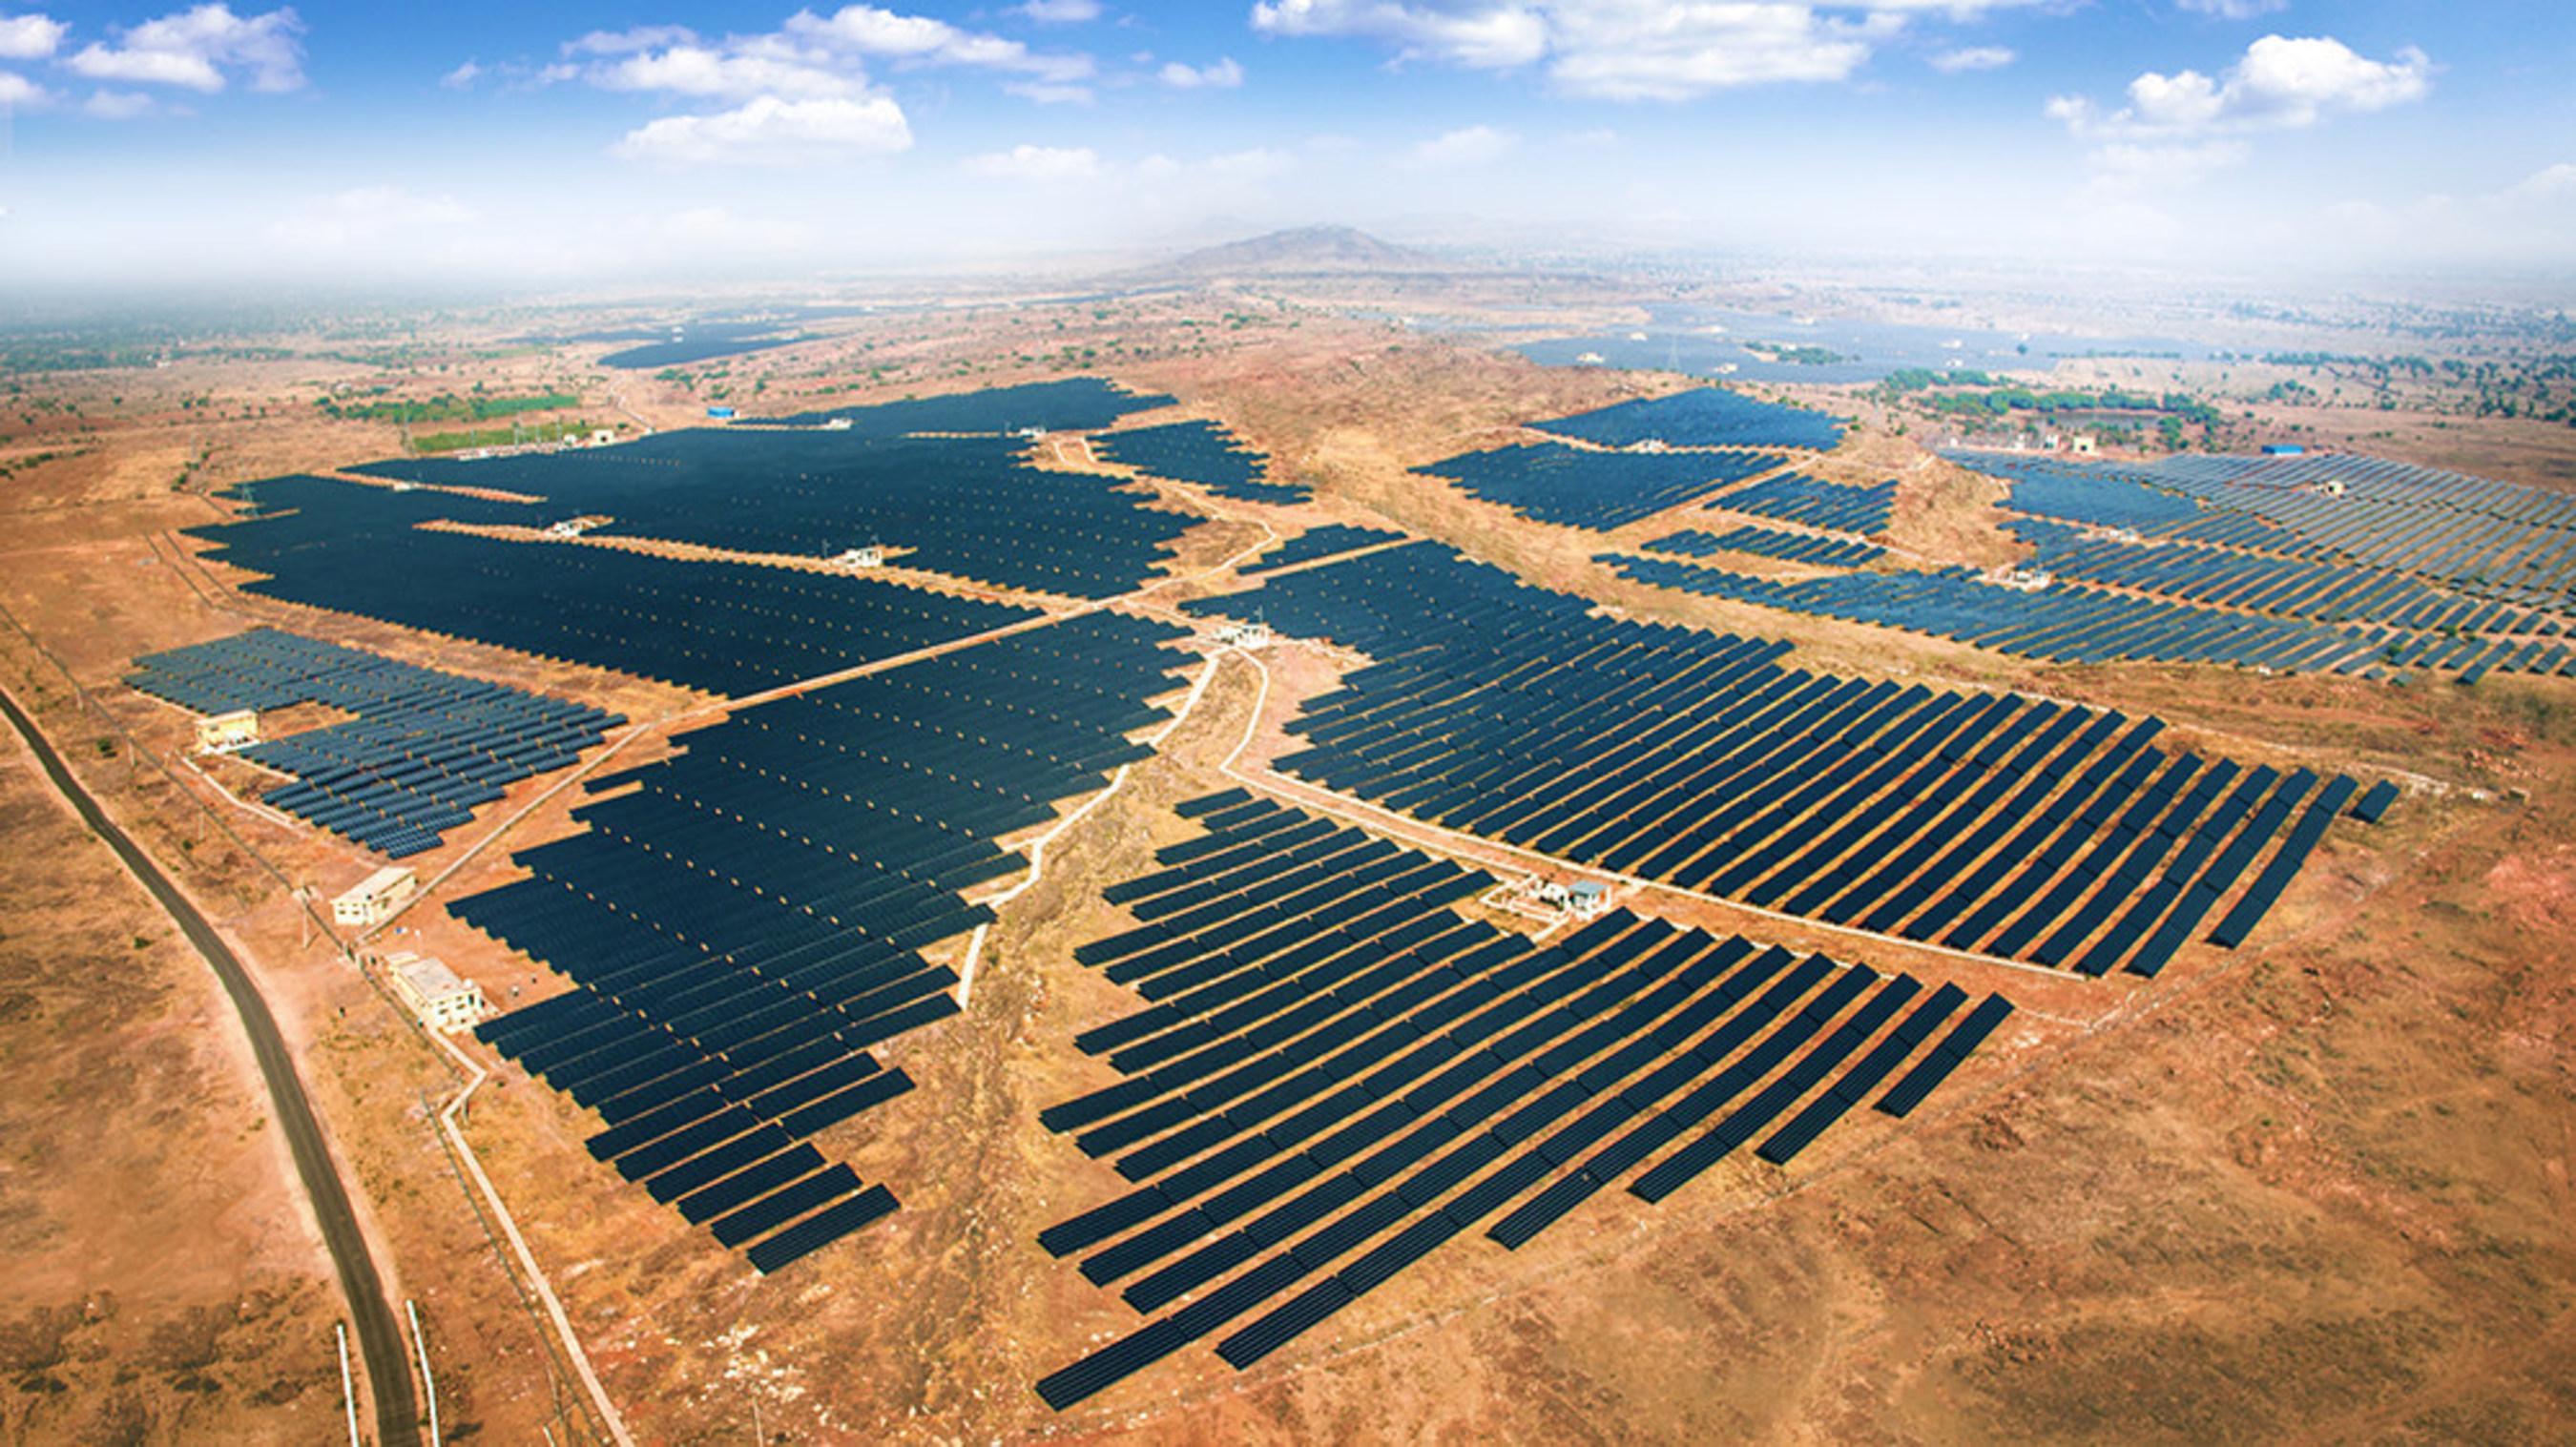 Azure Power Solar Power Plant, 100 MW, Rajasthan, India